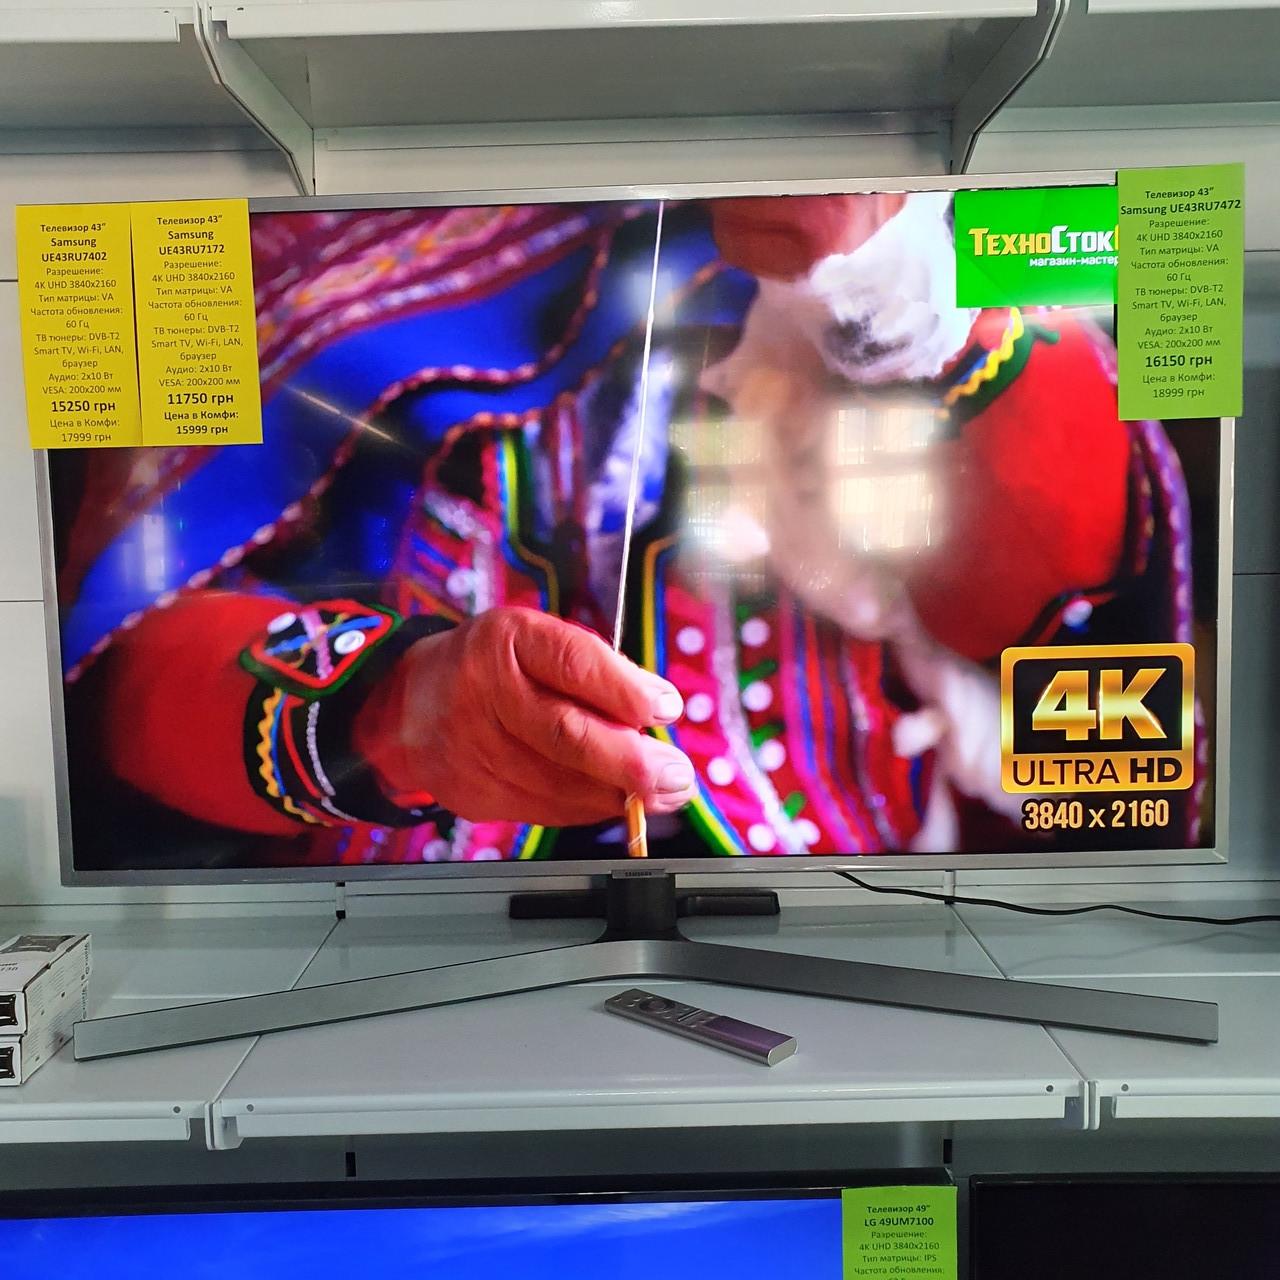 Телевизор 43 Samsung UE43RU717(4KUHD 3840x2160 VA / 60ГЦ / DVBT2,Smart TV)